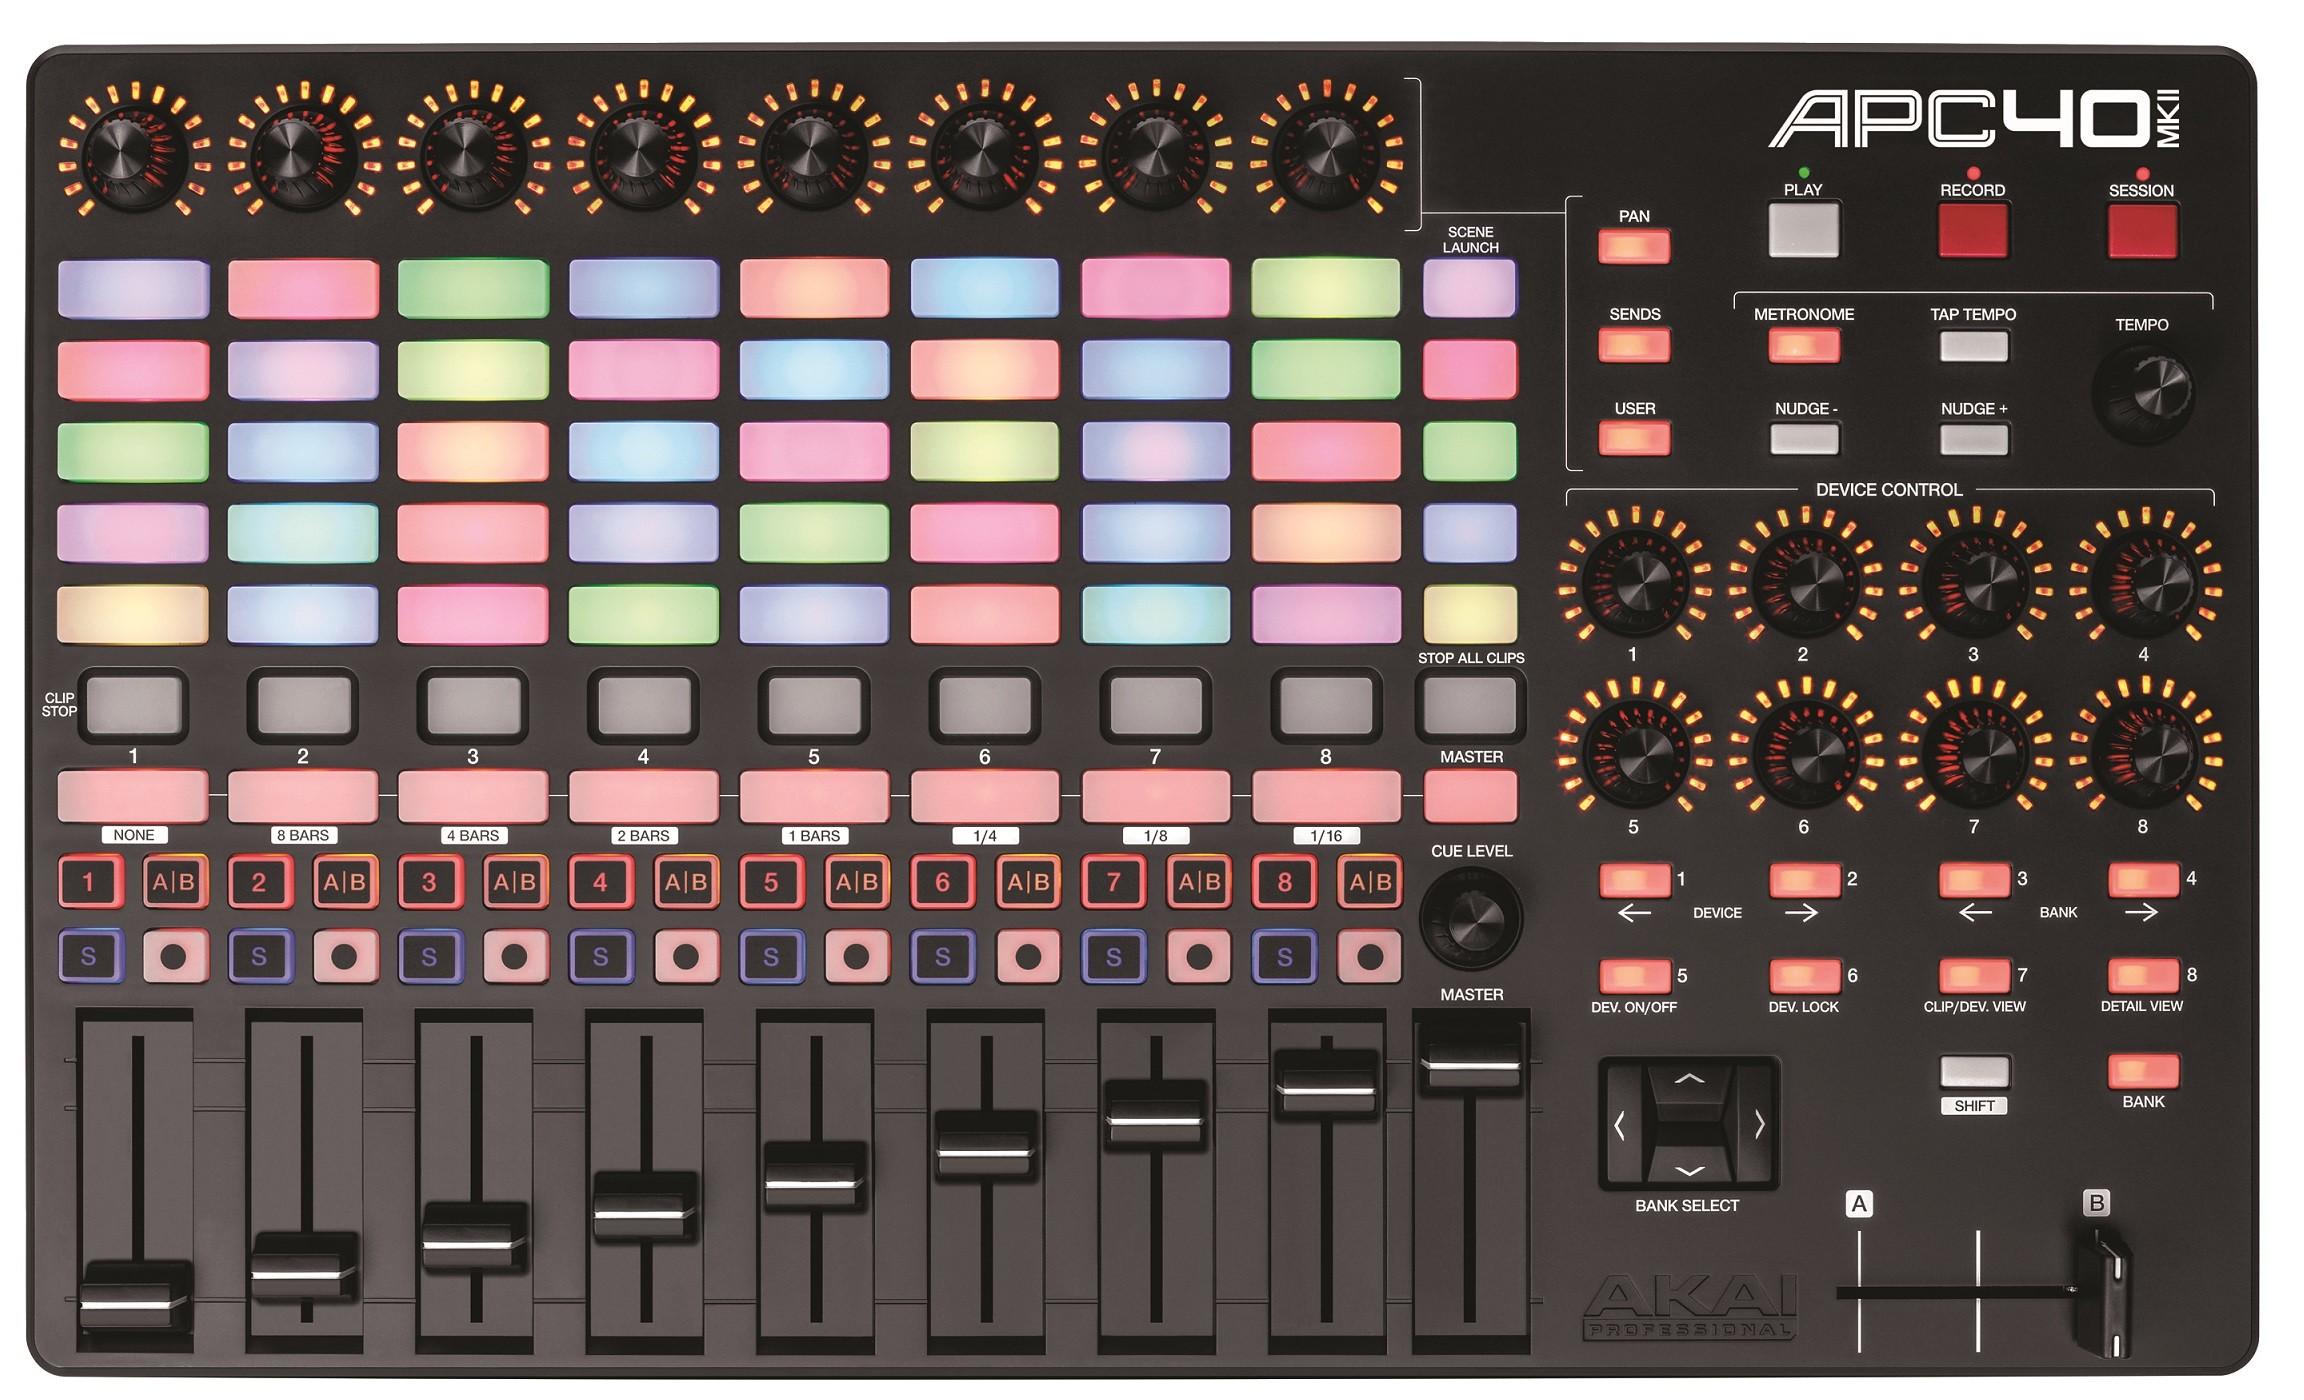 Dj-контроллер Akai APC 40 II USB